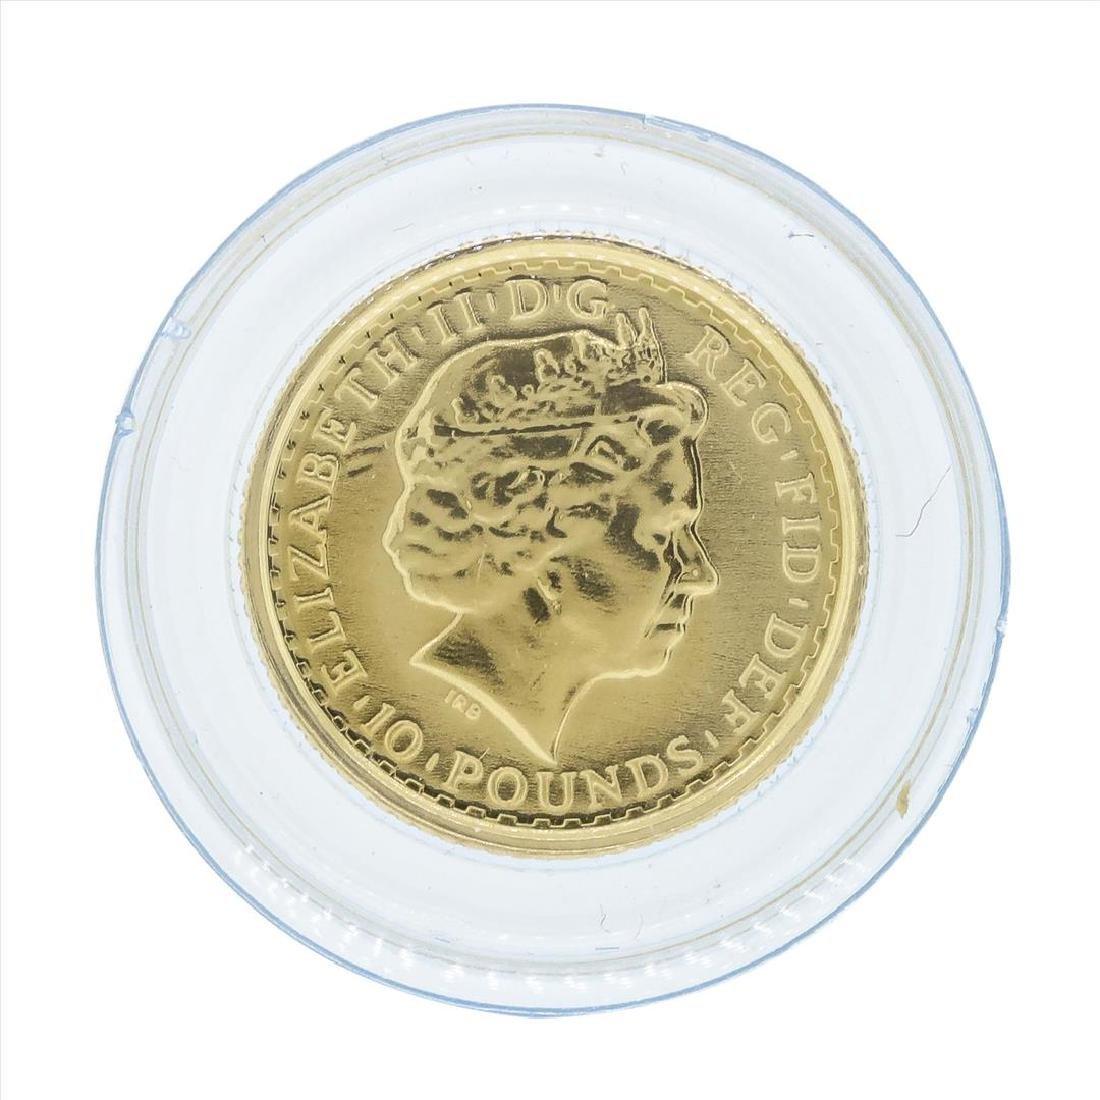 2008 Britannia 1/10 oz Proof Gold Coin